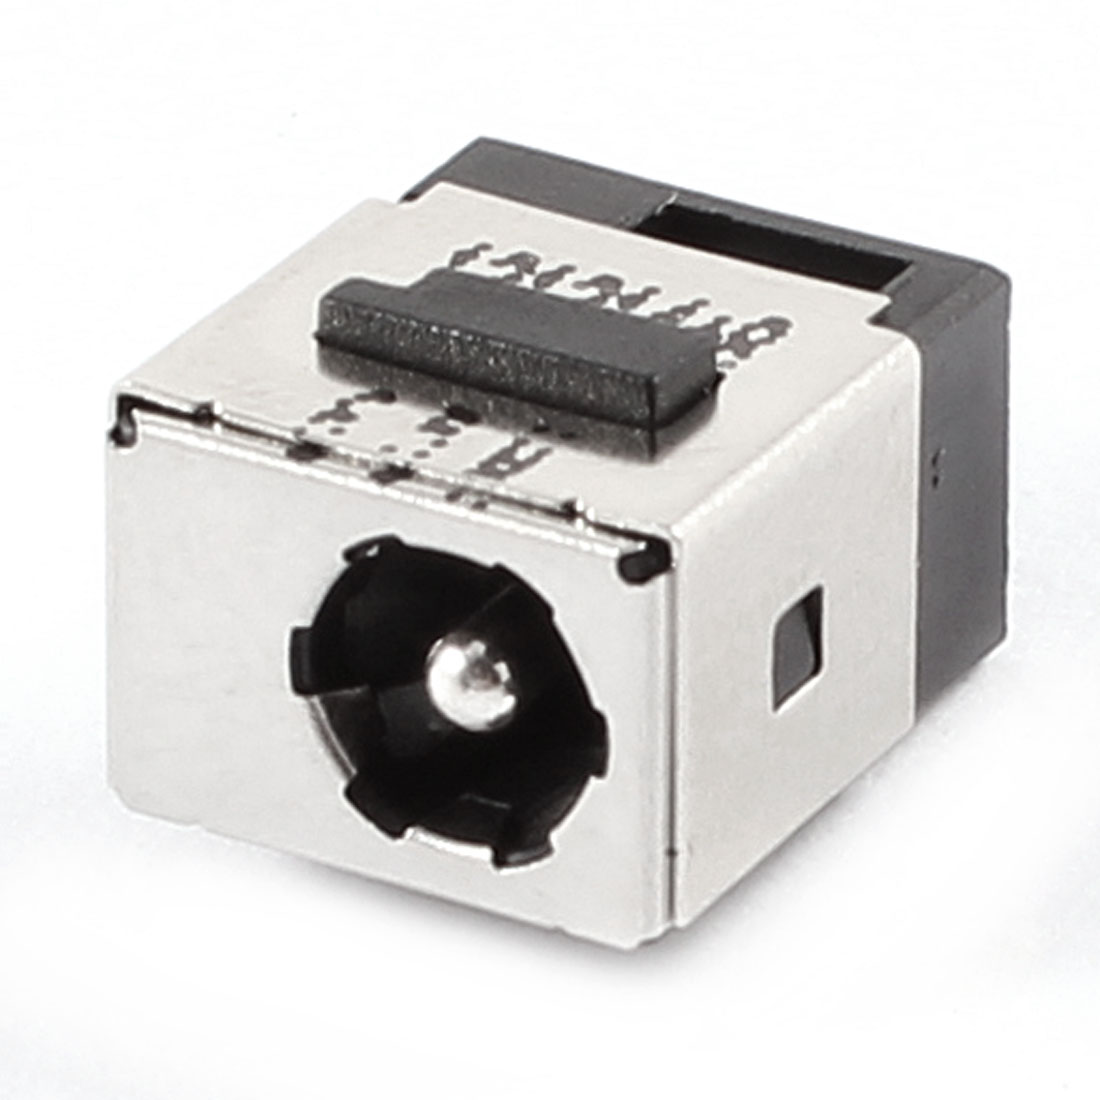 PJ027 DC Power Jack Connector Socket for HP Pavilion DV5000 DV8000 Series